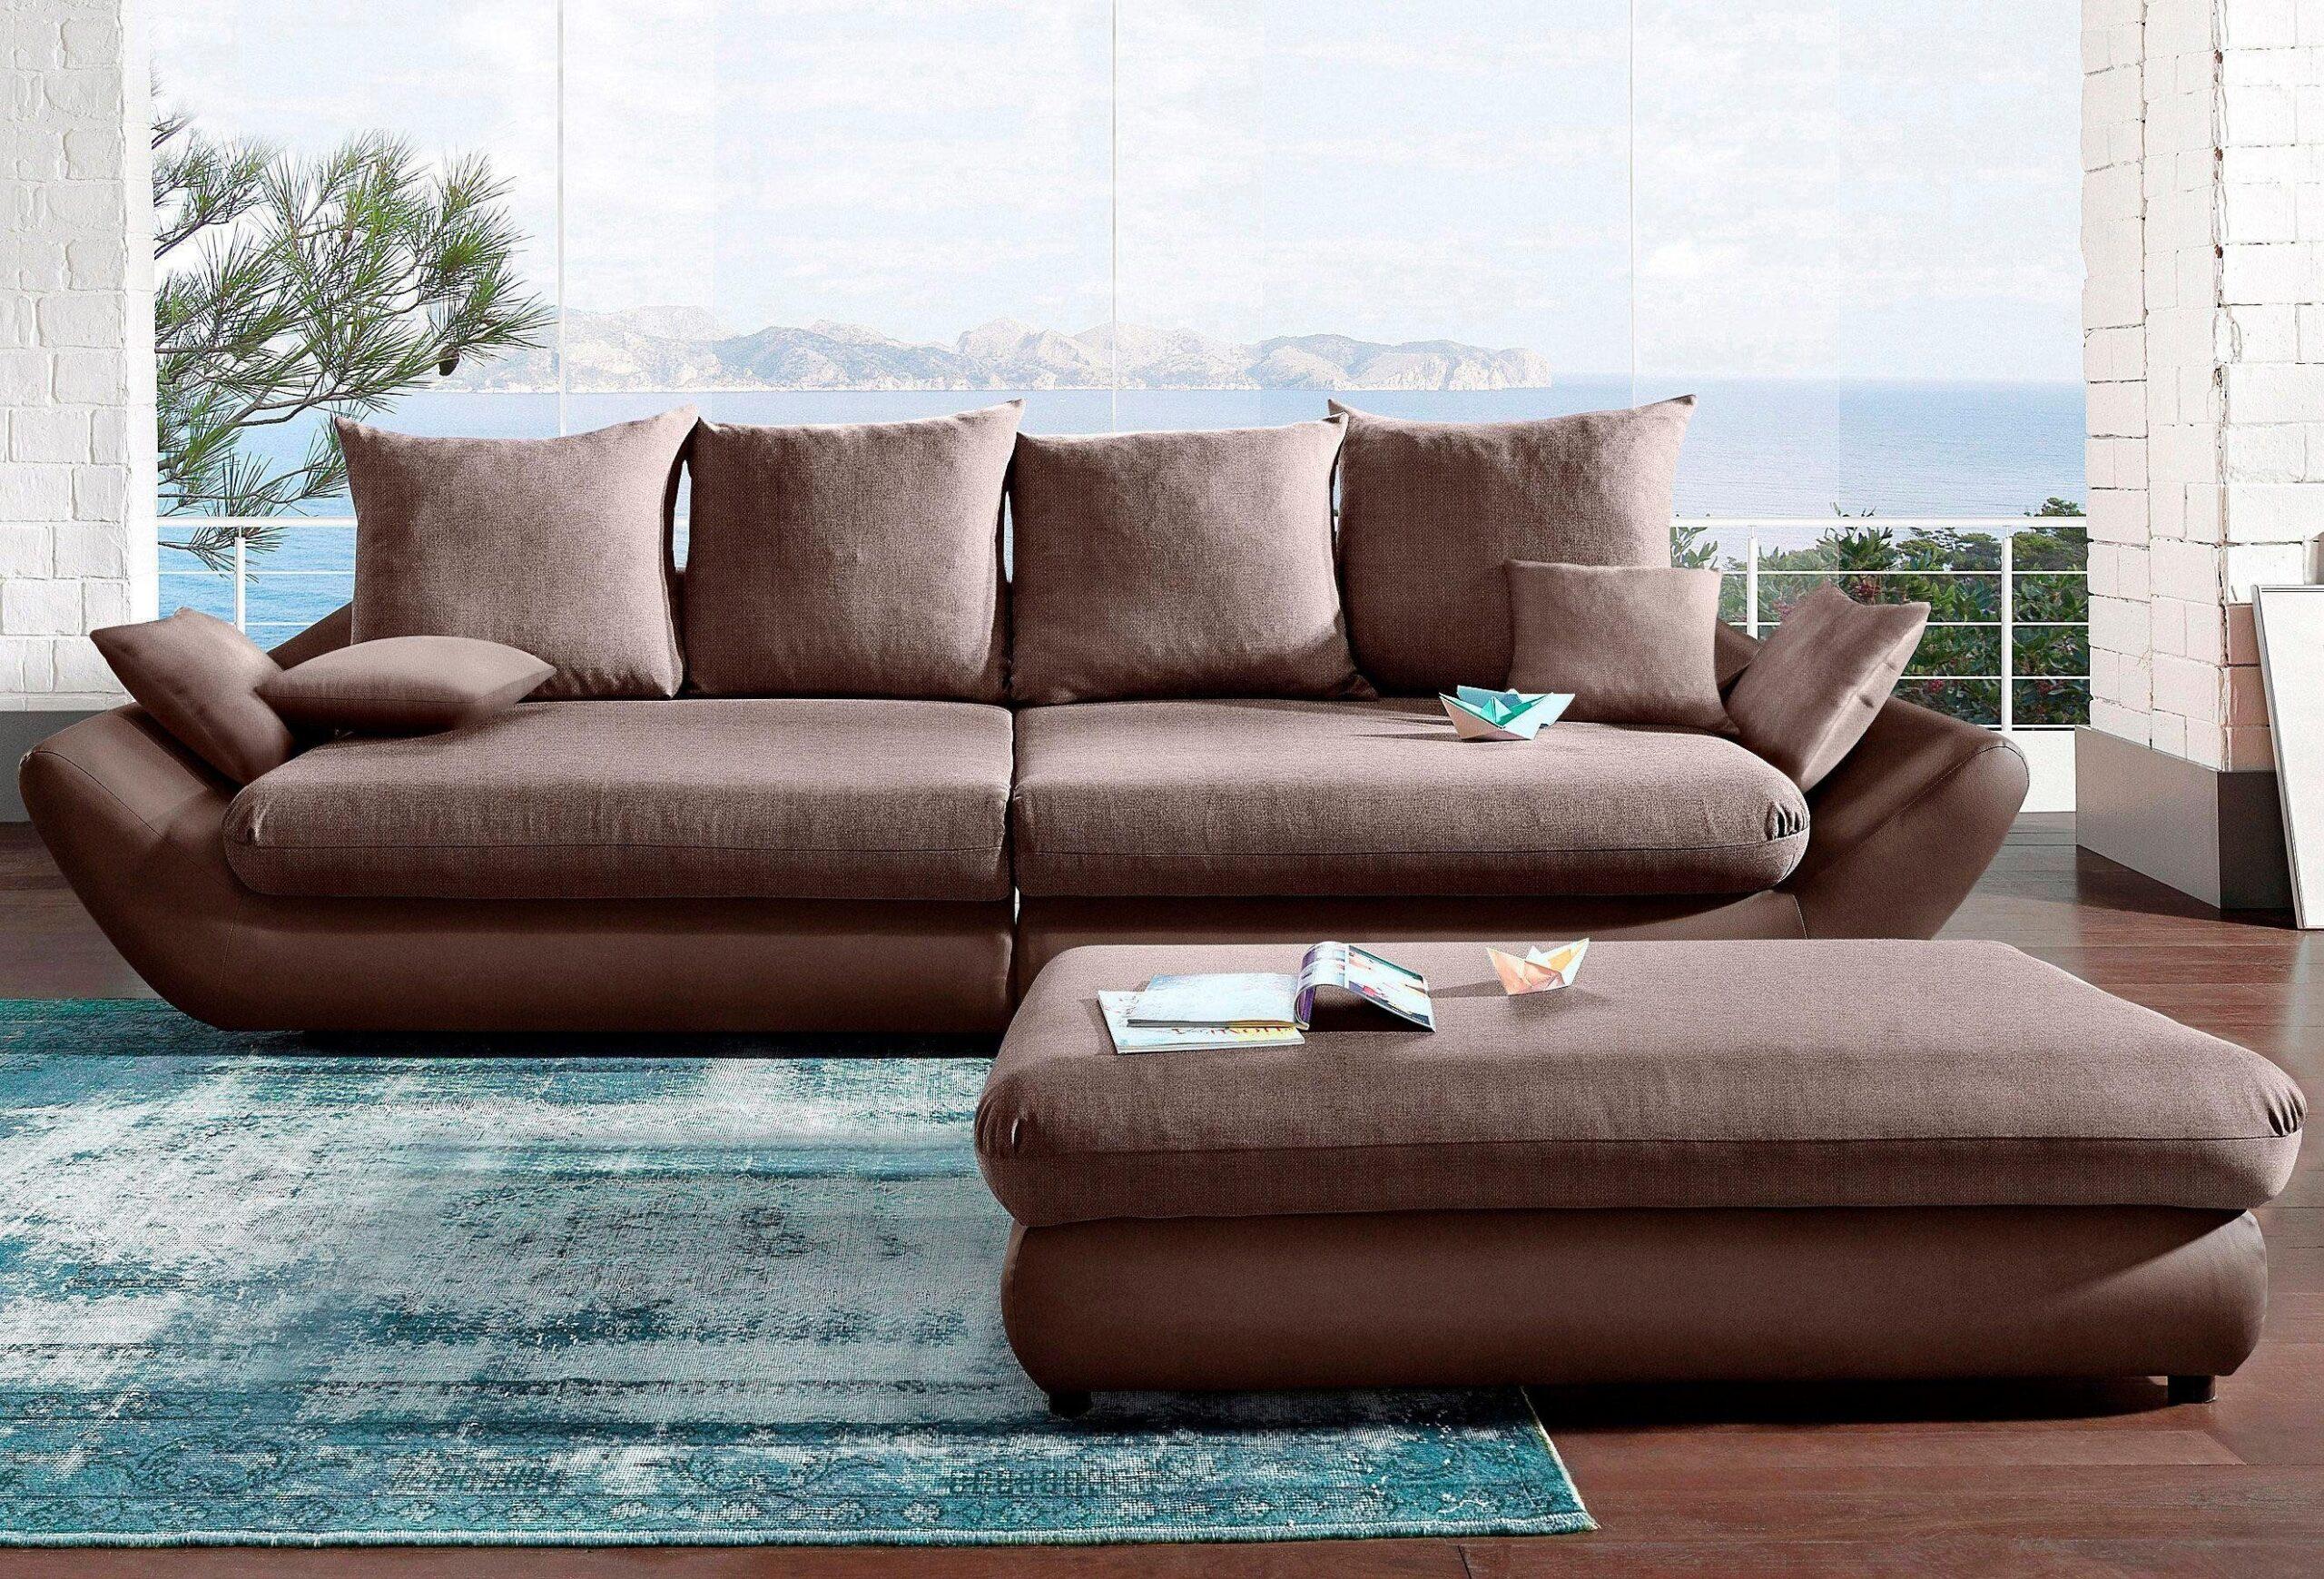 Full Size of Megasofa Aruba Sofa Gigant In Schwarz Mit Strukturstoff Wohnzimmer Megasofa Aruba